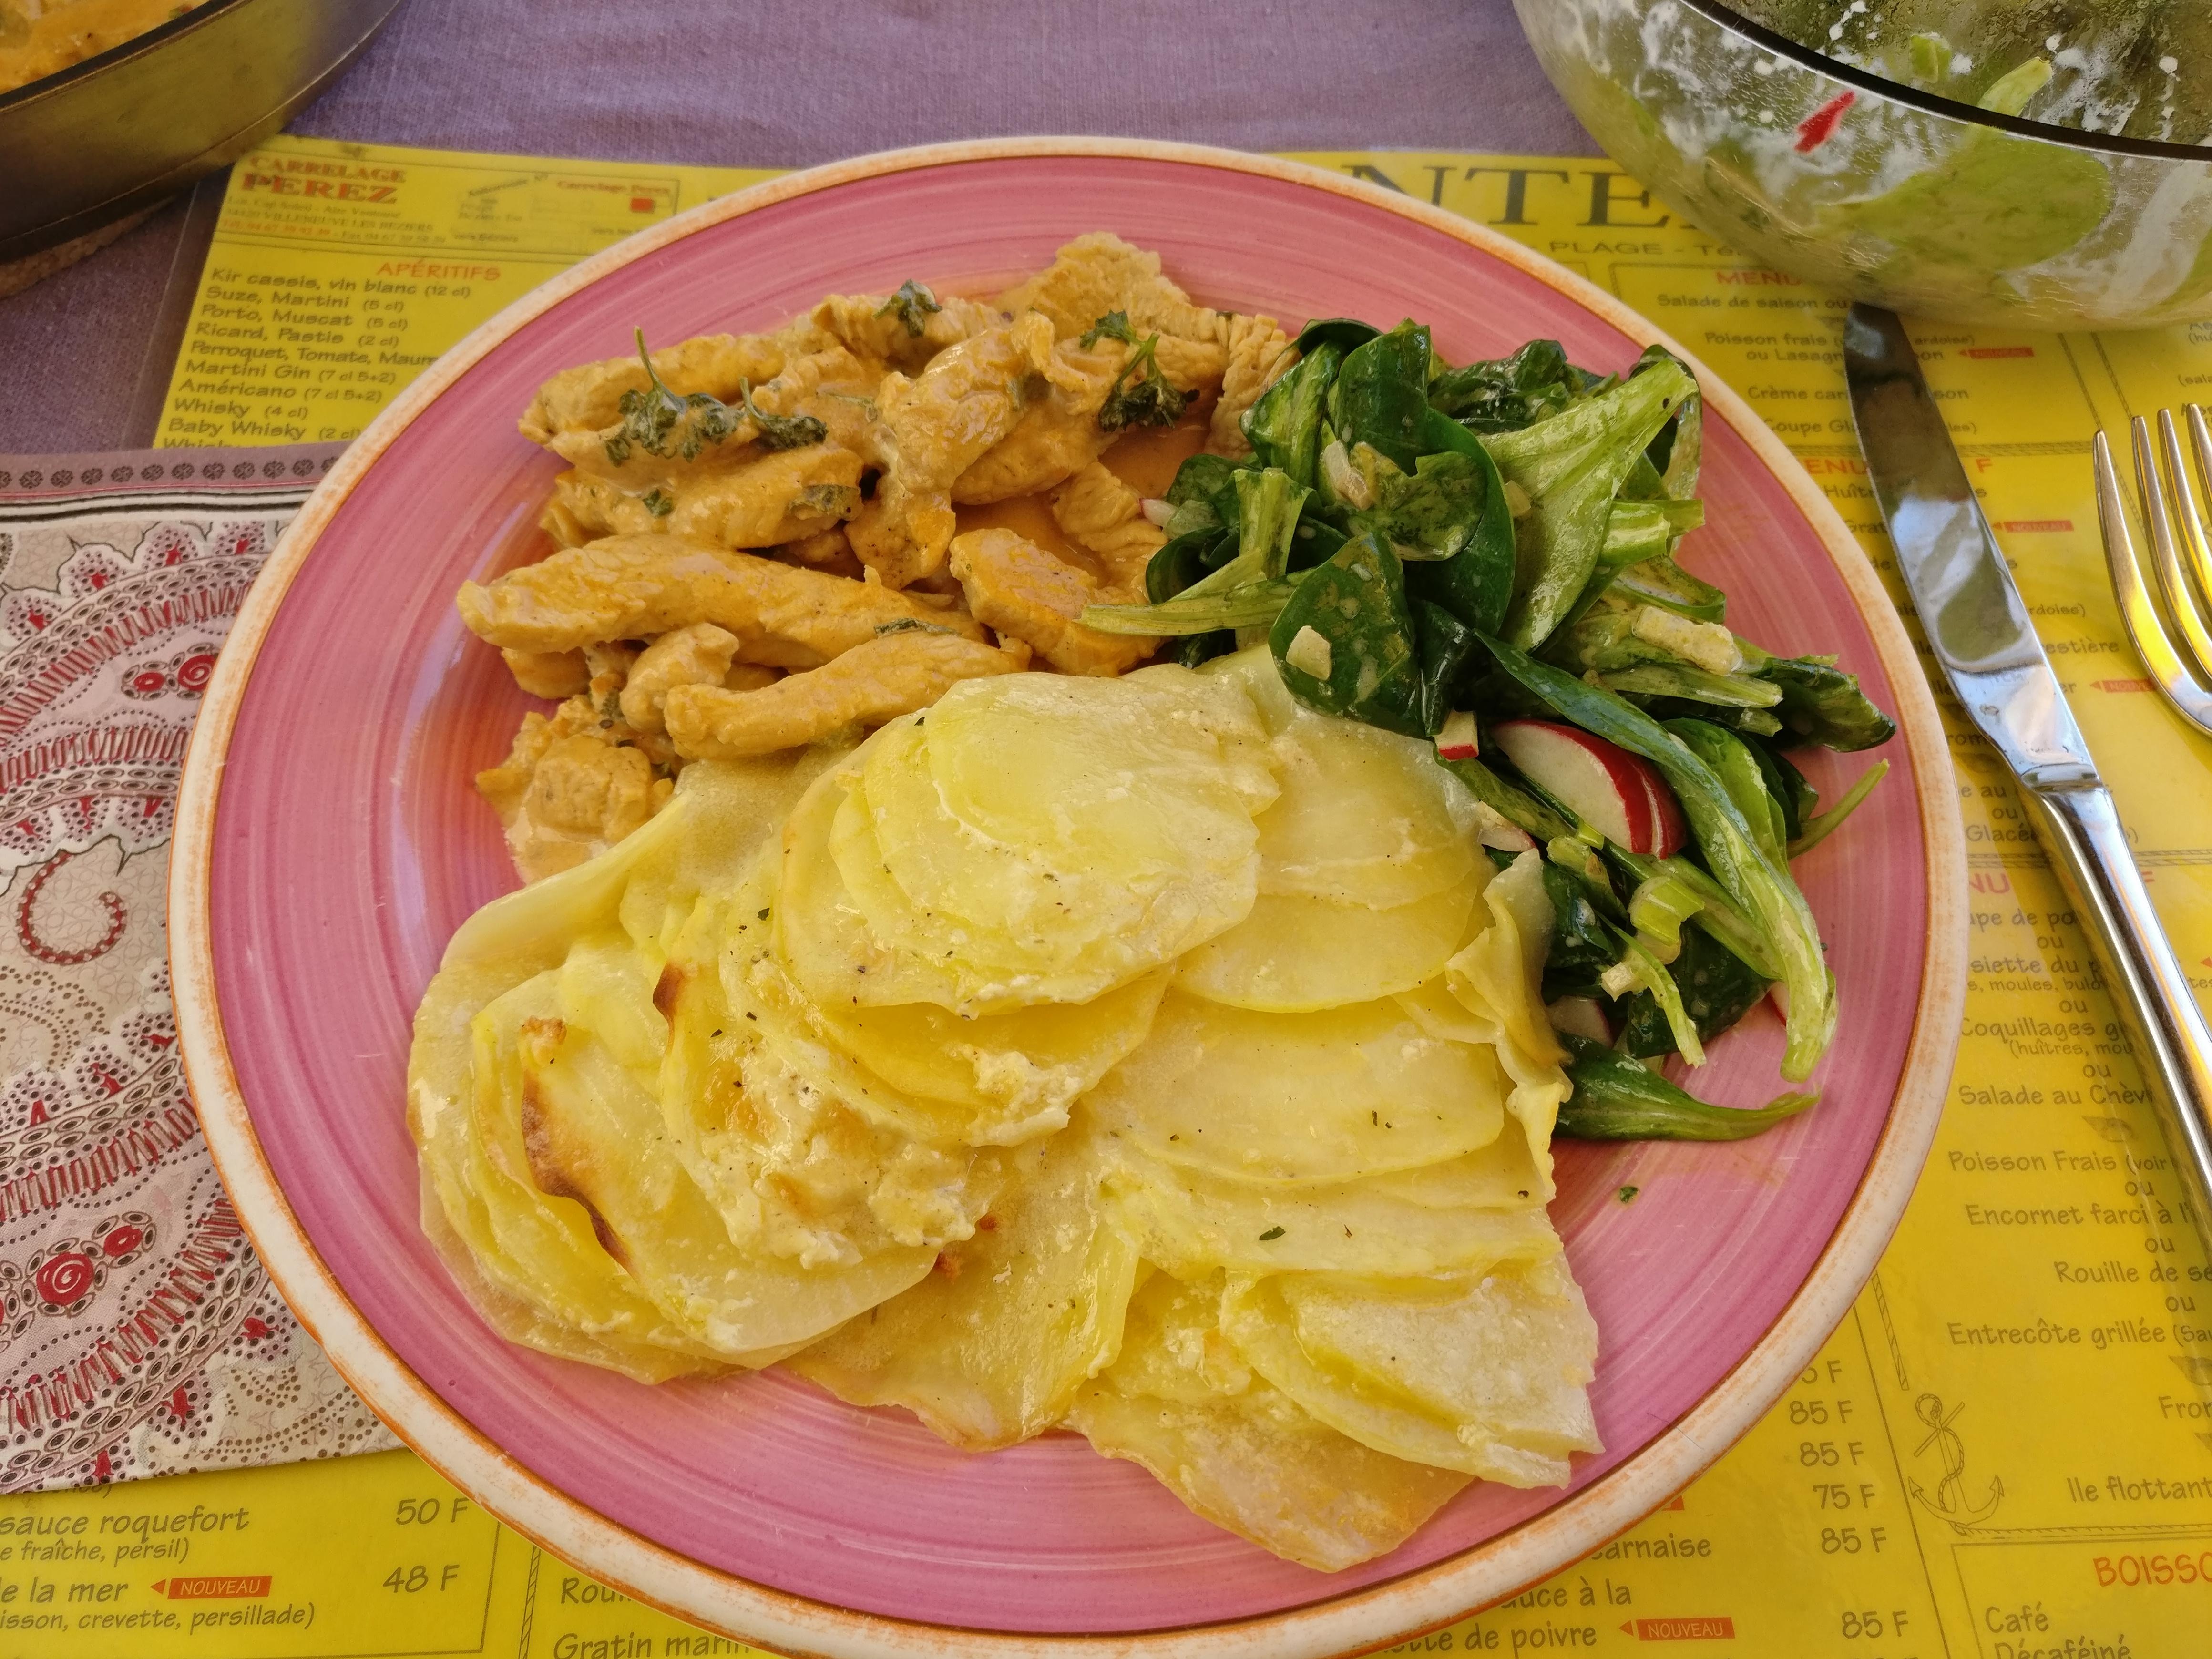 http://foodloader.net/nico_2017-04-09_putengeschnetzeltes-kartoffelgratin-ackersalat.jpg